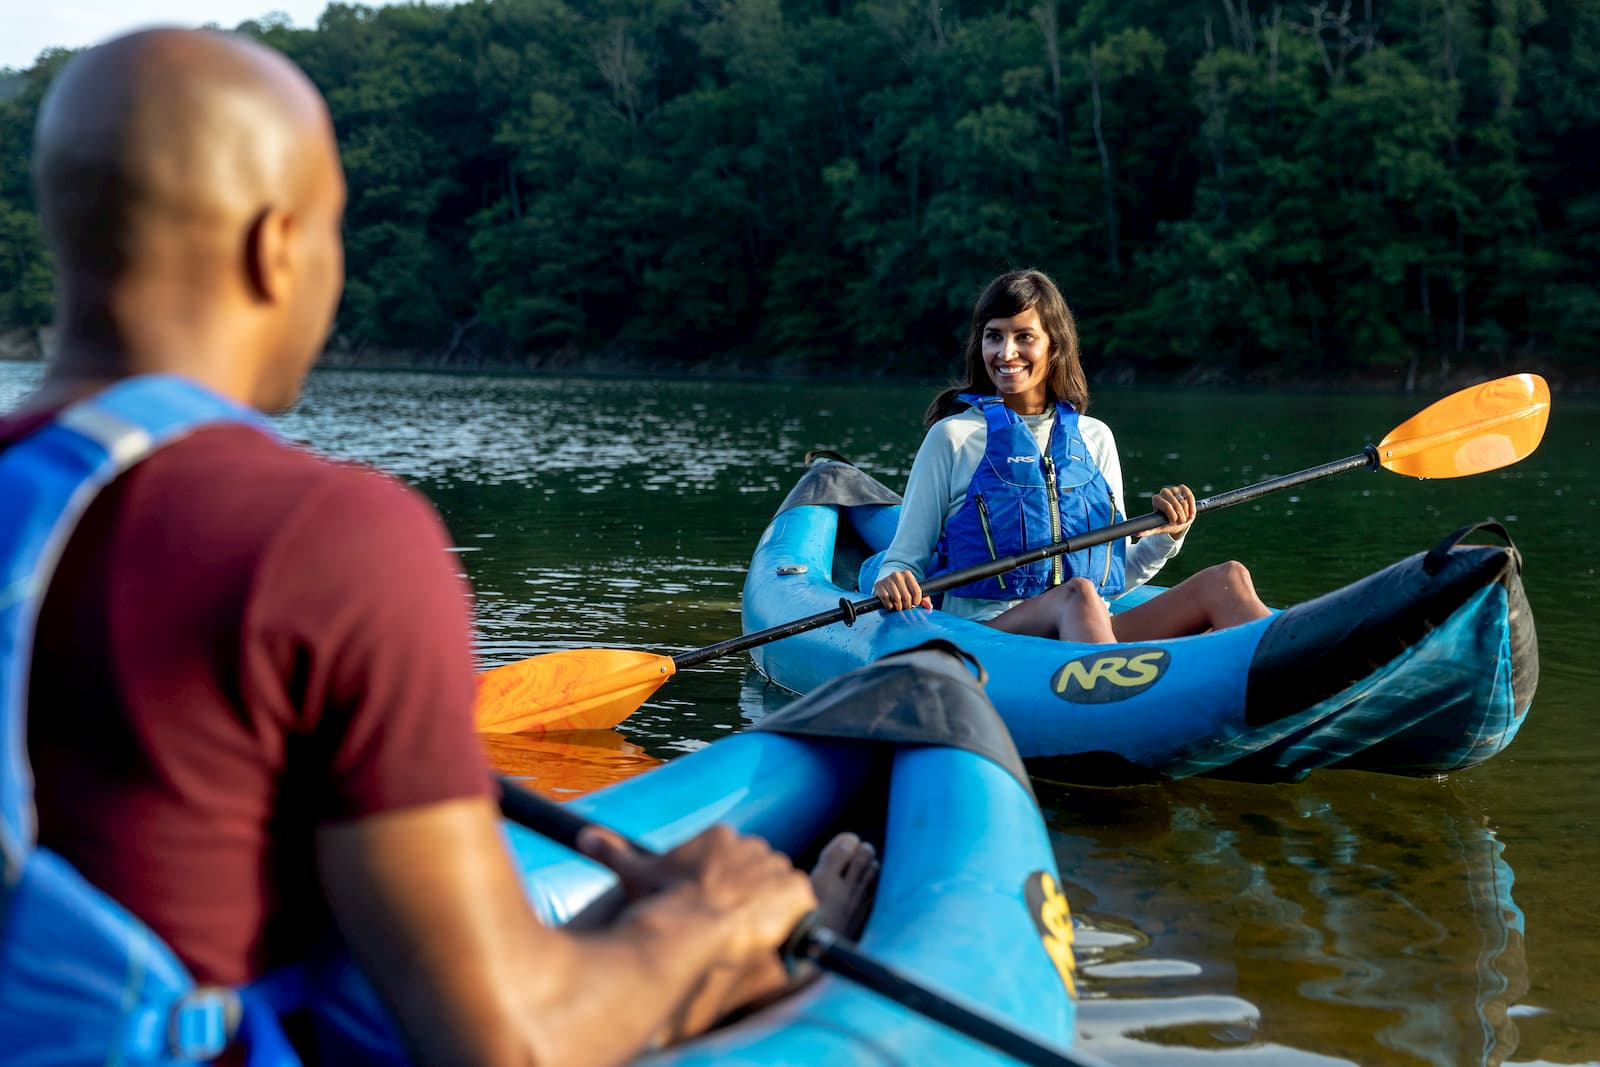 Sports nautiques - Kayak